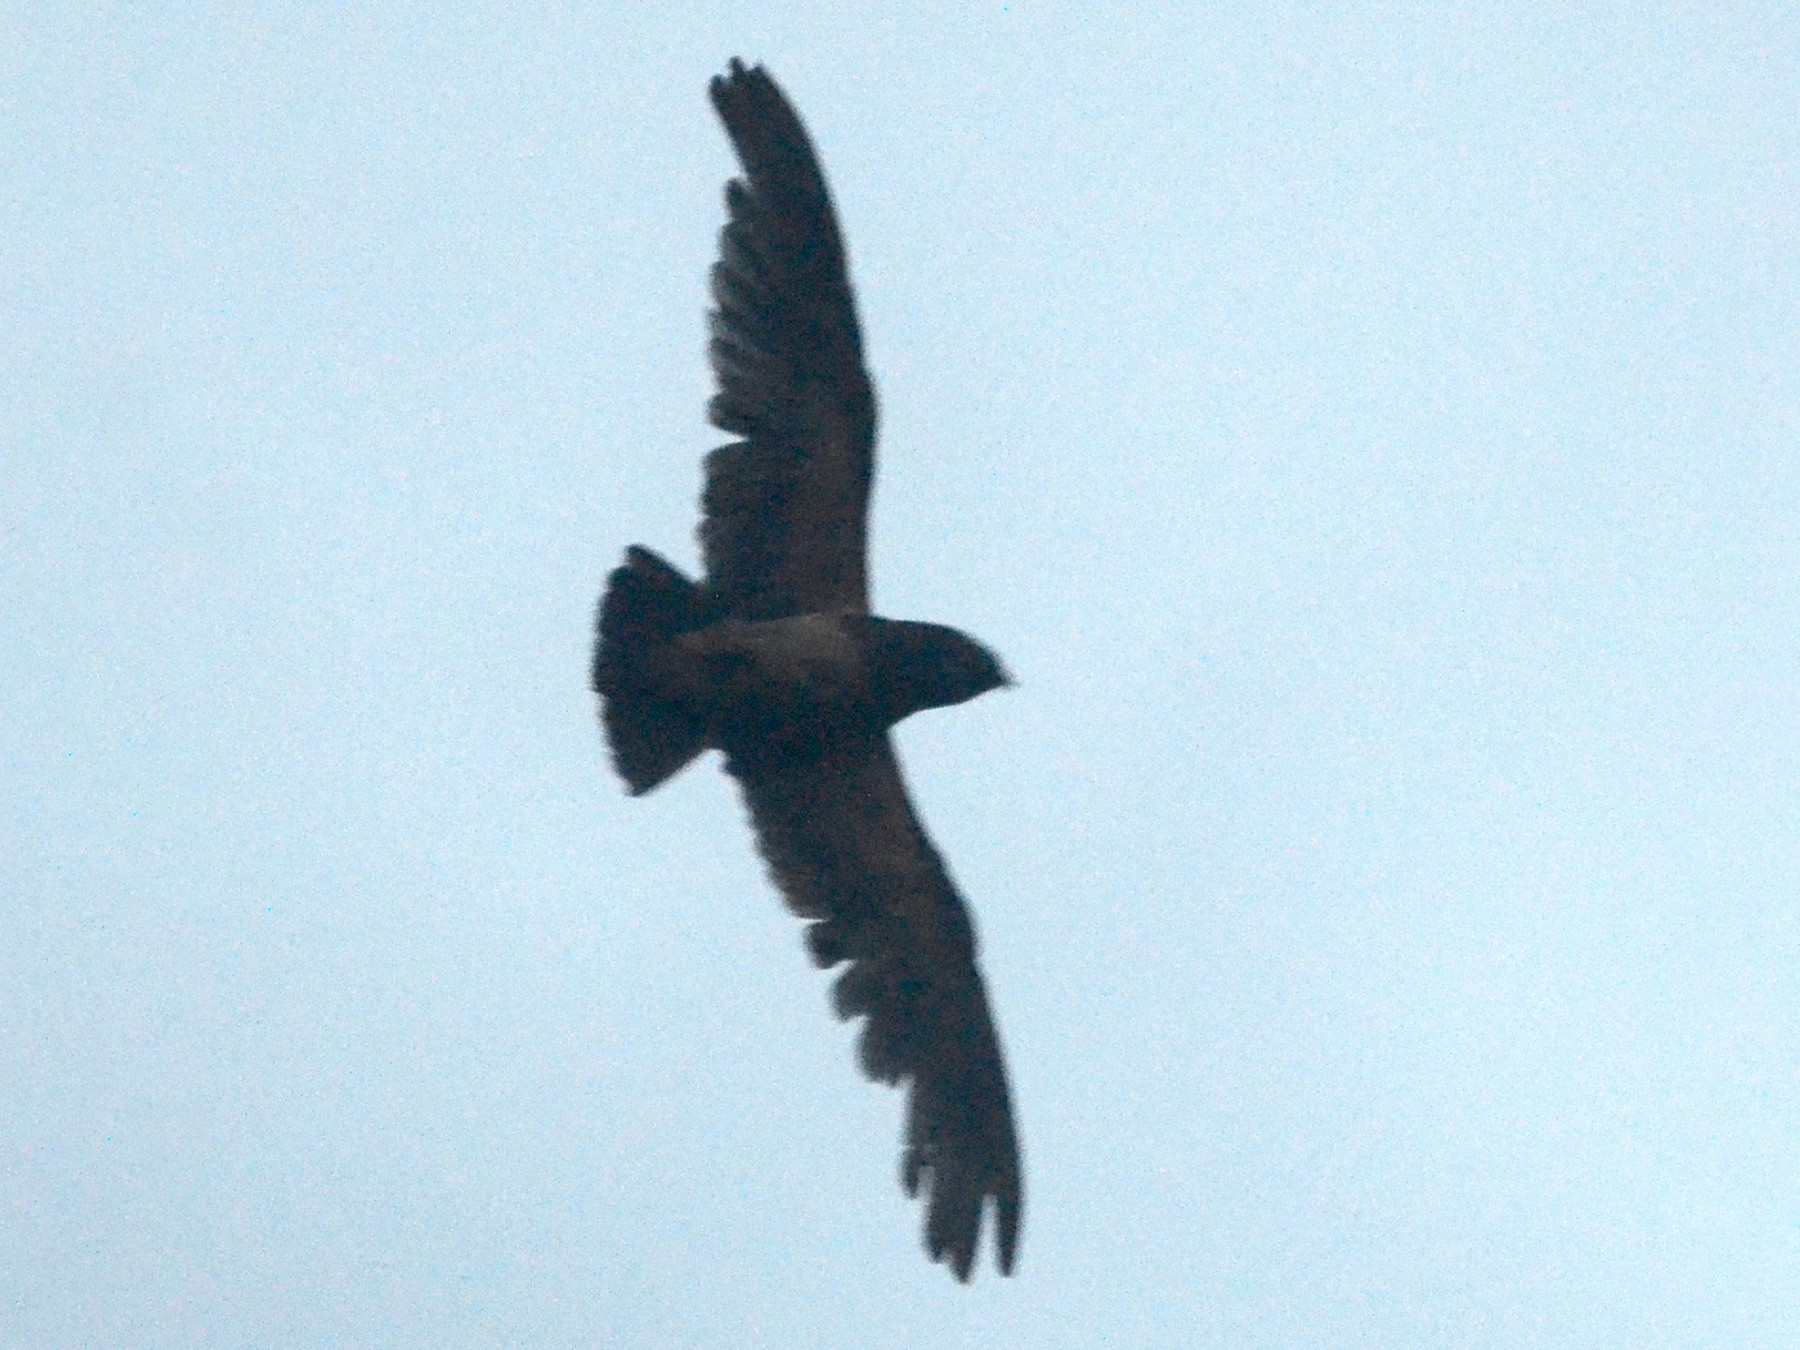 Rufous-bellied Nighthawk - Nikolaj Mølgaard Thomsen